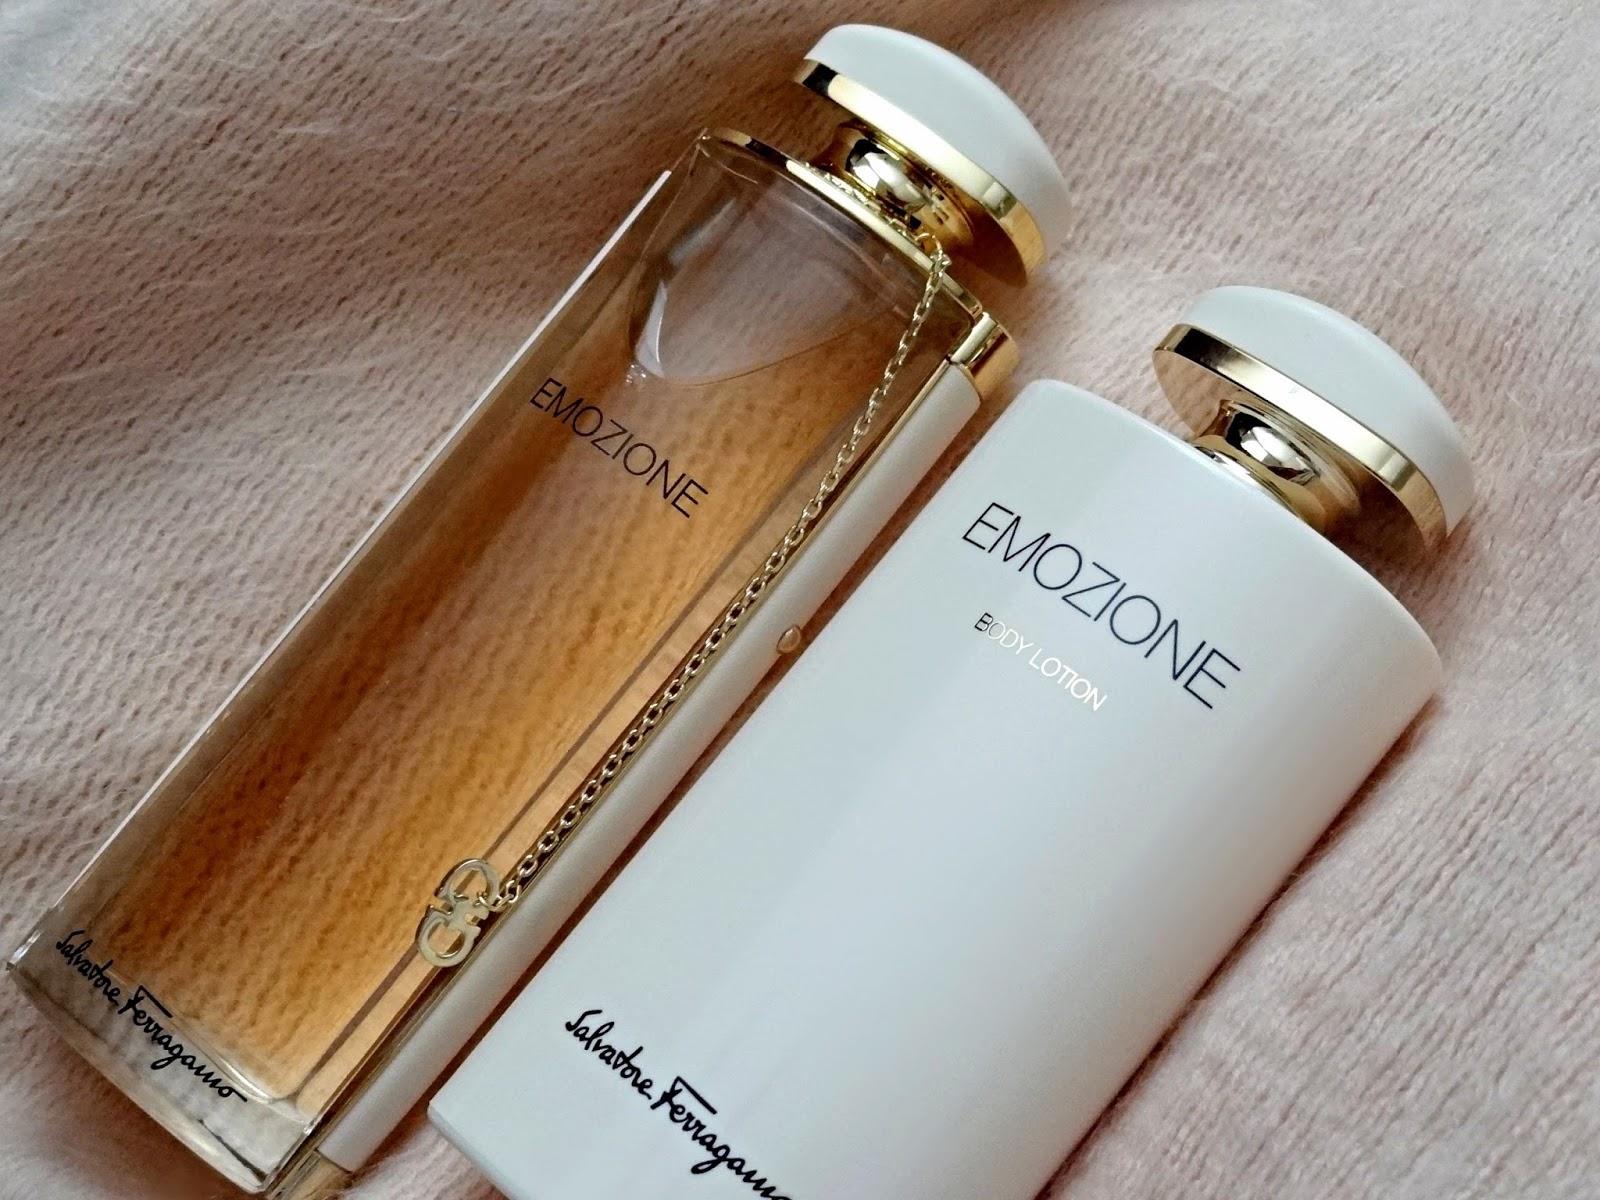 Salvatore Ferragamo Emozione Eau de Parfum and Body Lotion